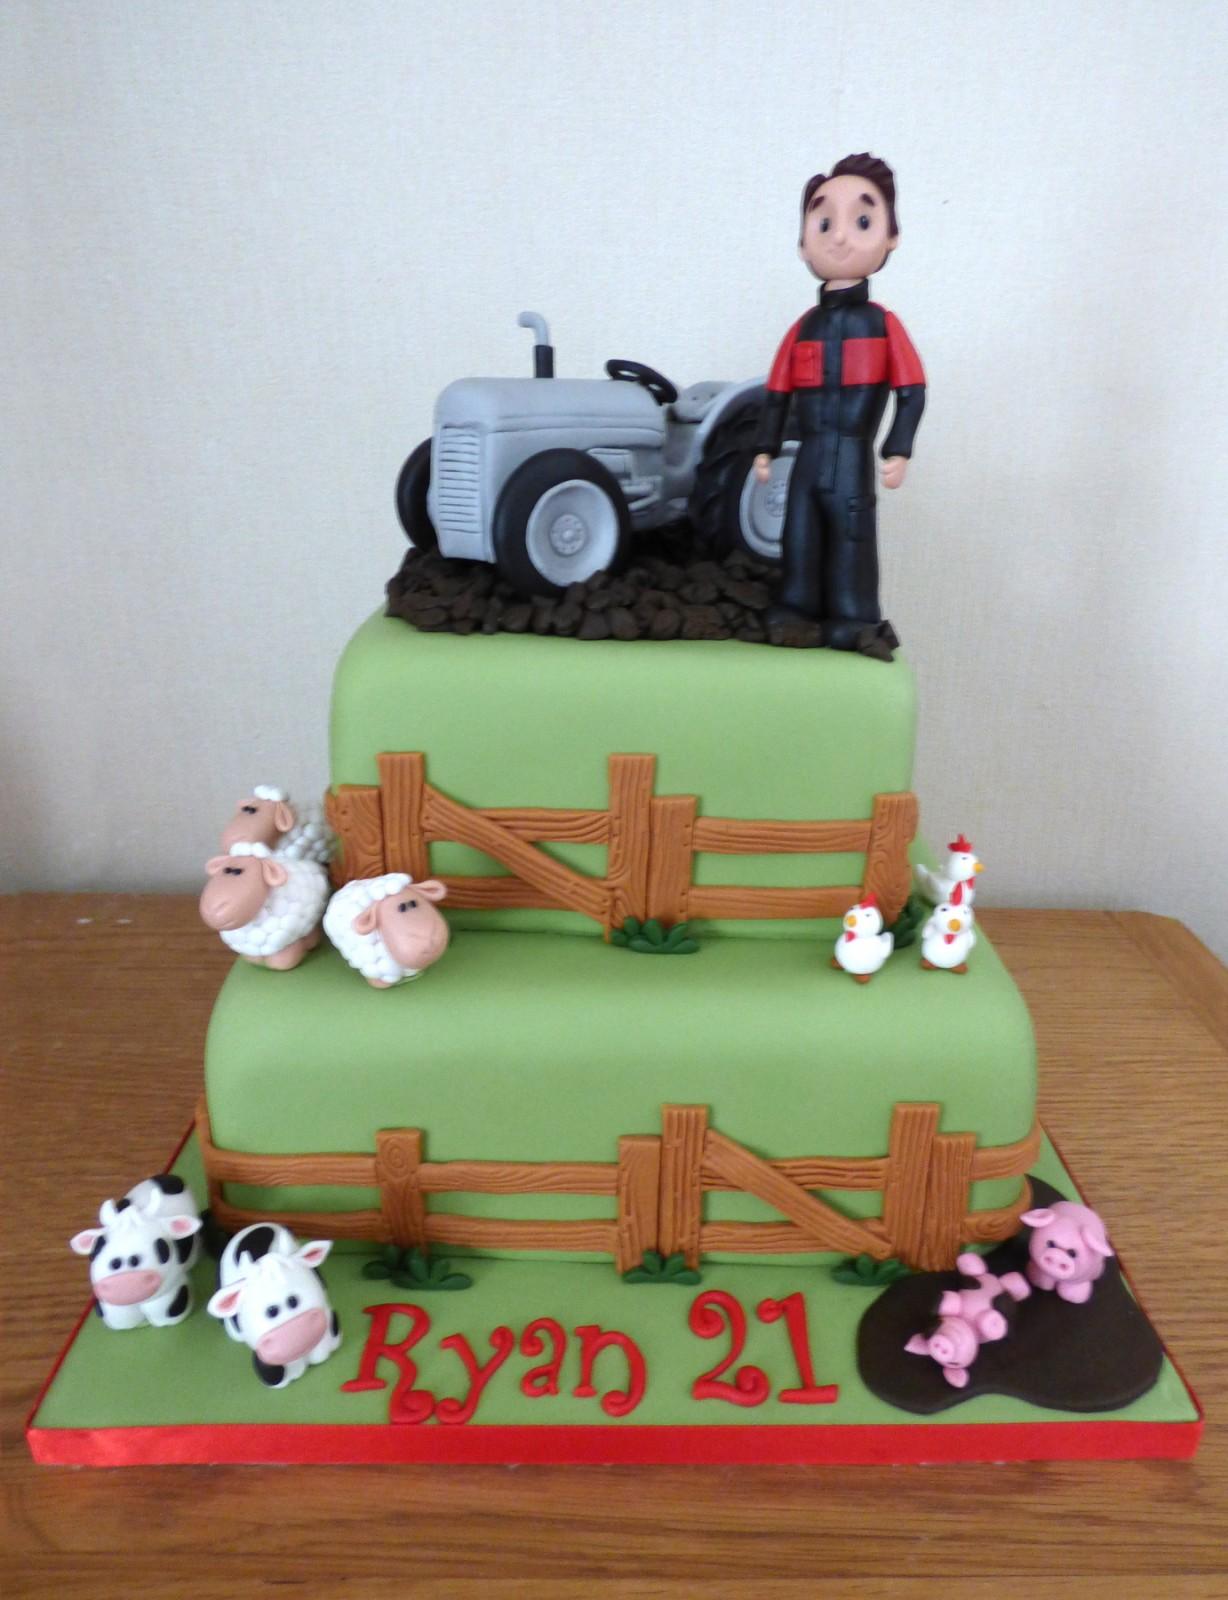 Brilliant 2 Tier Grey Fergie Tractor And Farmer Birthday Cake Susies Cakes Funny Birthday Cards Online Unhofree Goldxyz